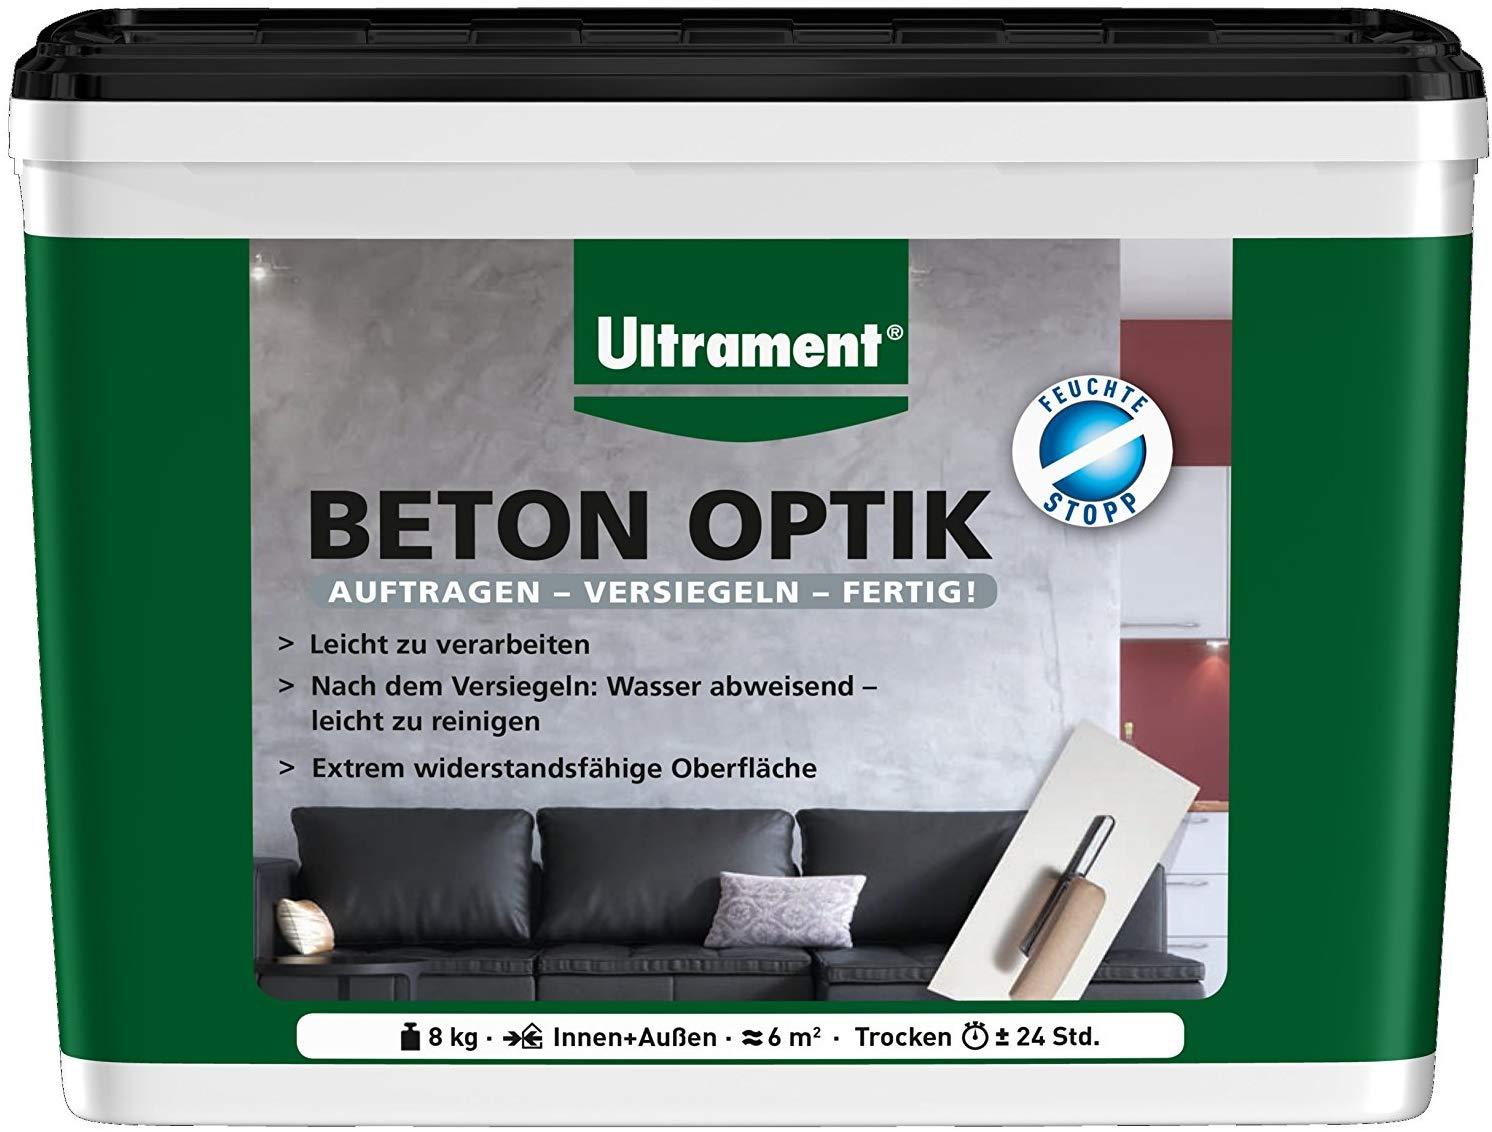 Ultrament Beton Optik